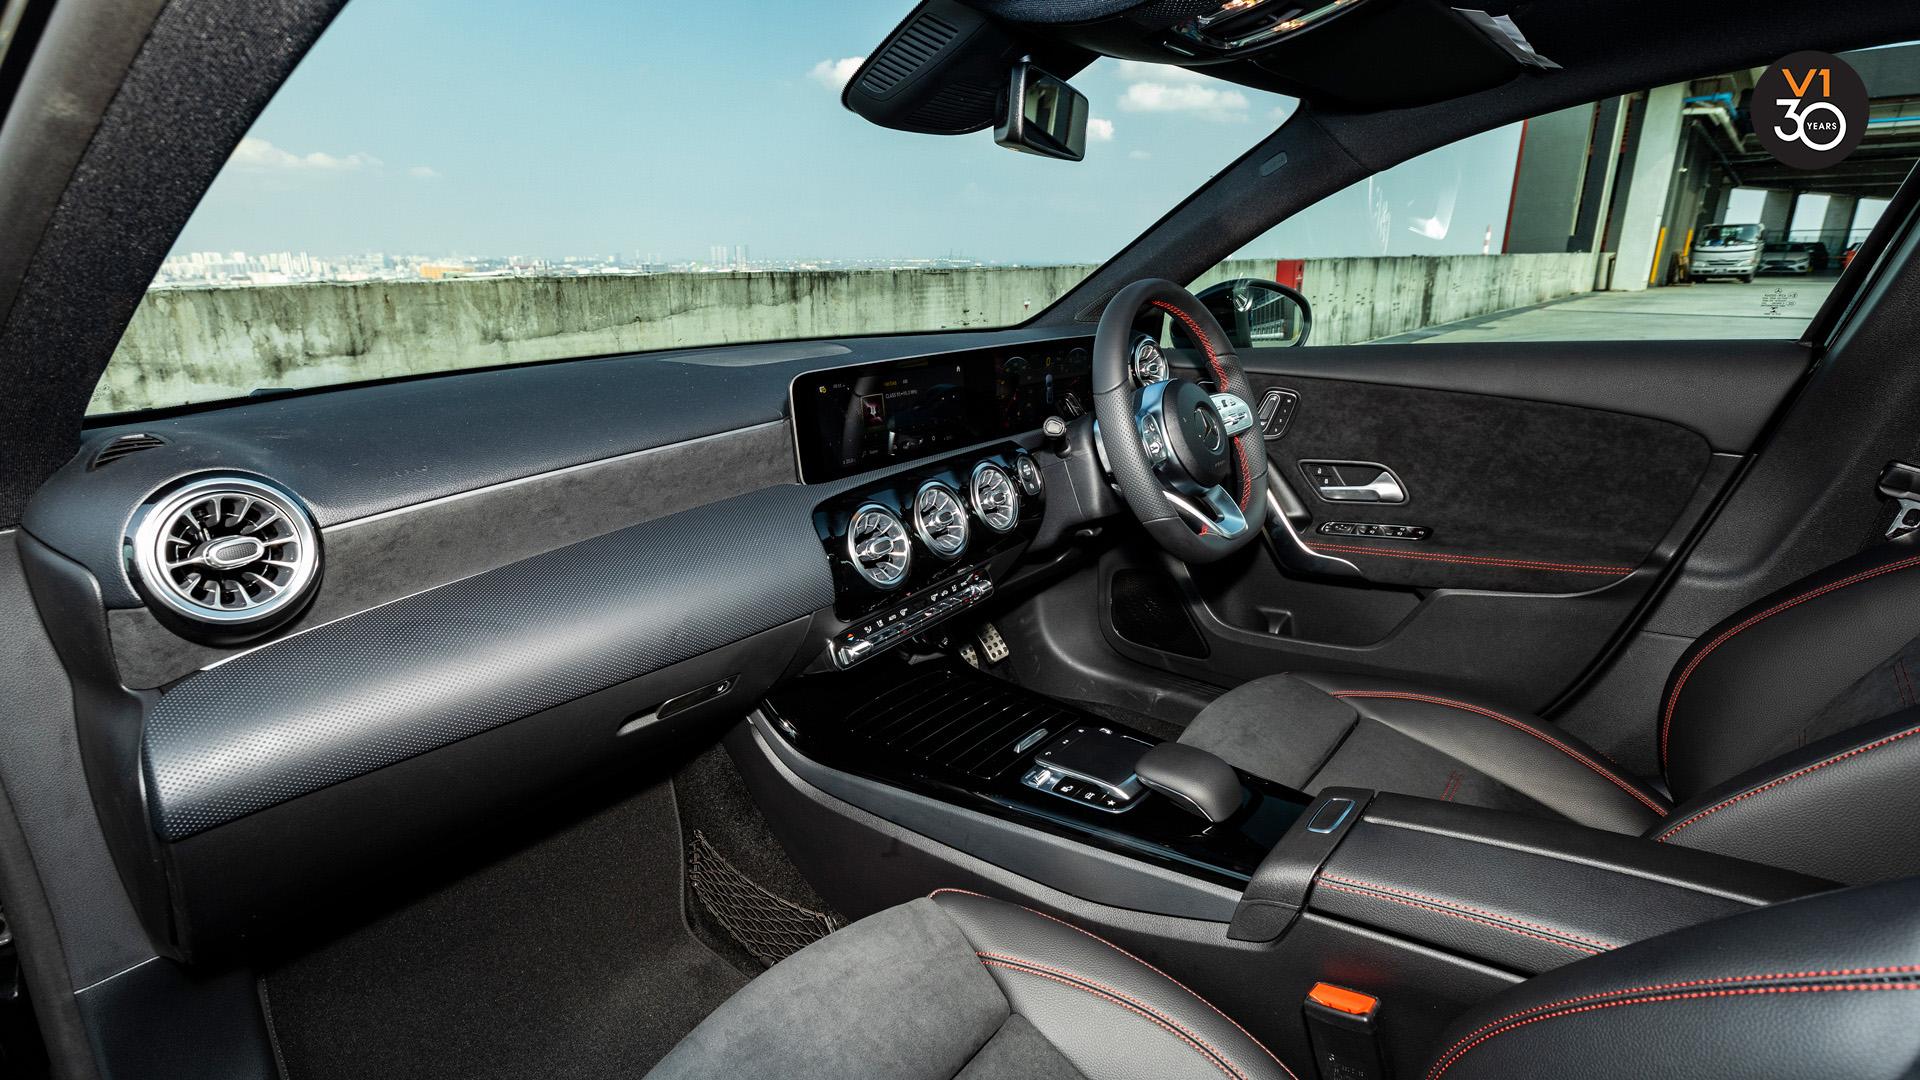 Mercedes-Benz A200 Saloon AMG Premium Plus - Dashboard